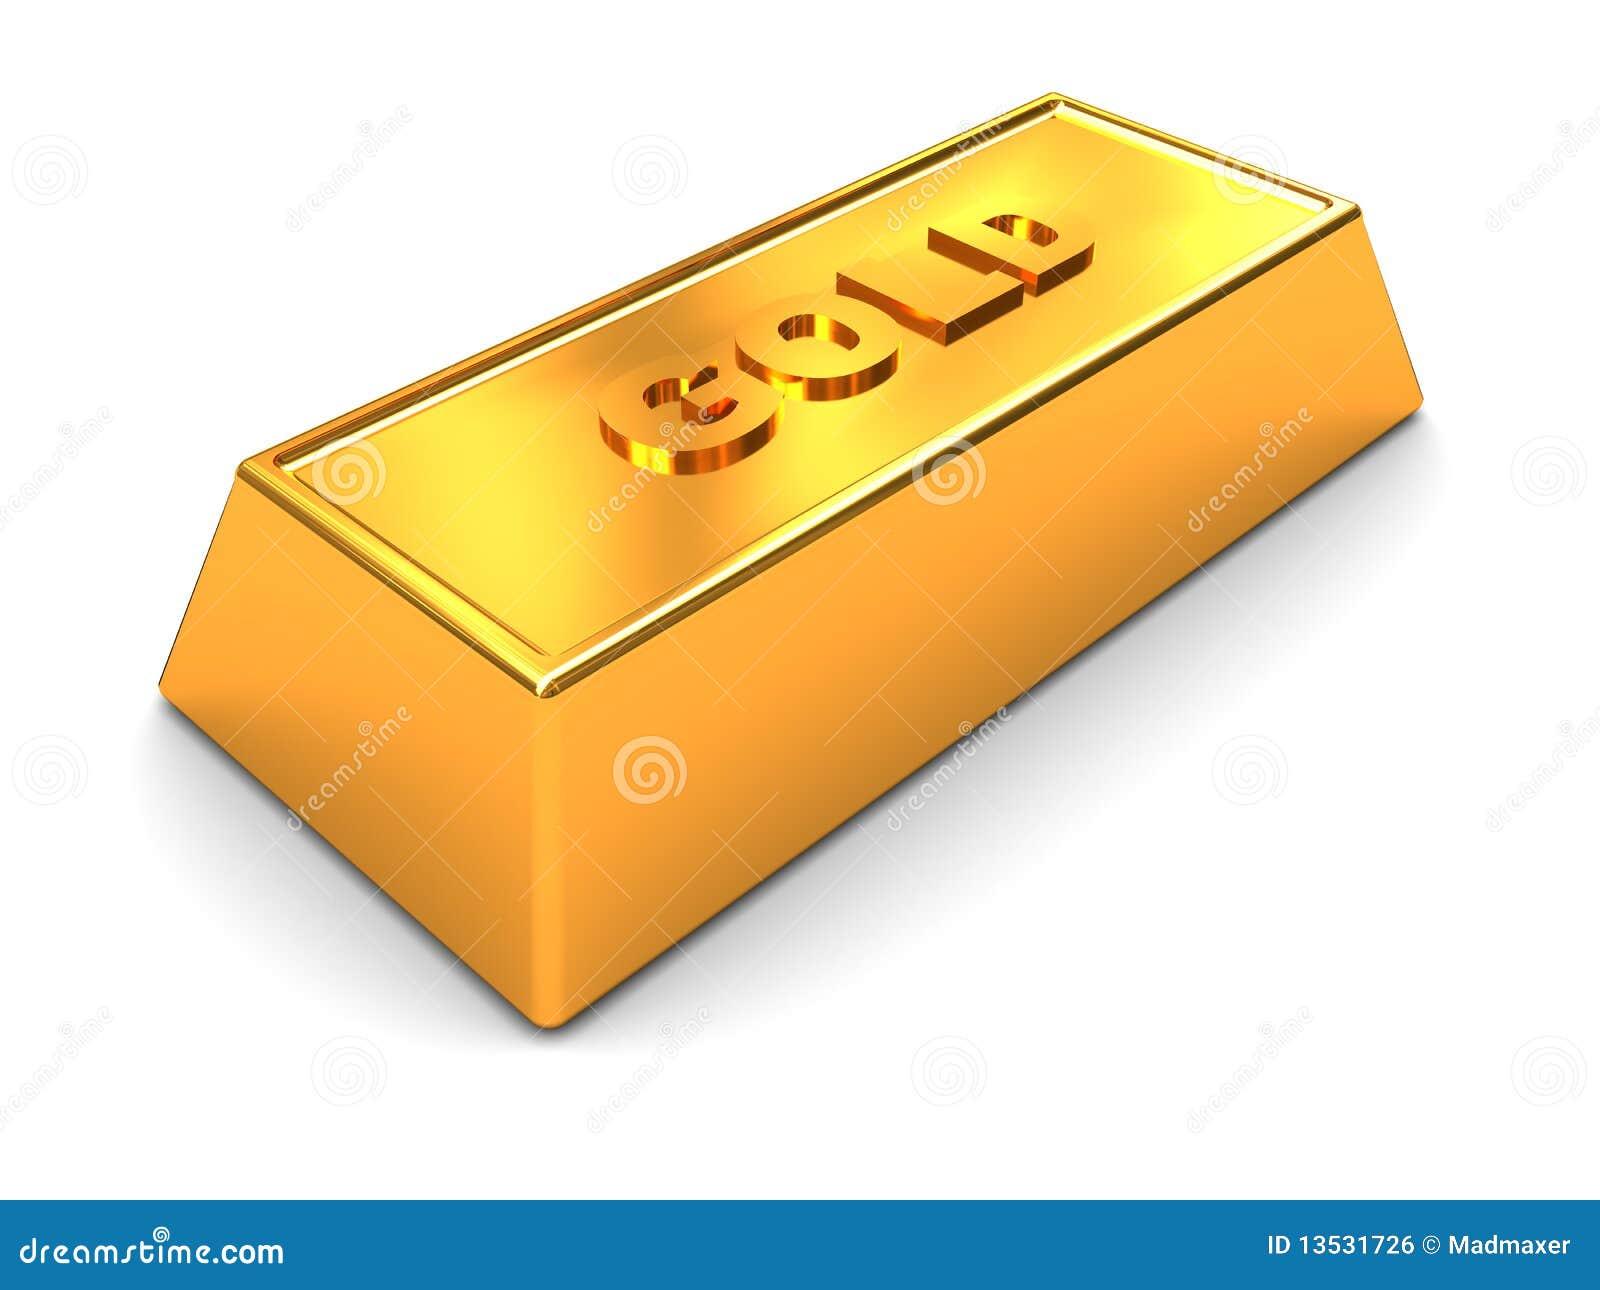 Golden Brick 3d Illustration Of Single Over White Background Royalty Free Stock Image